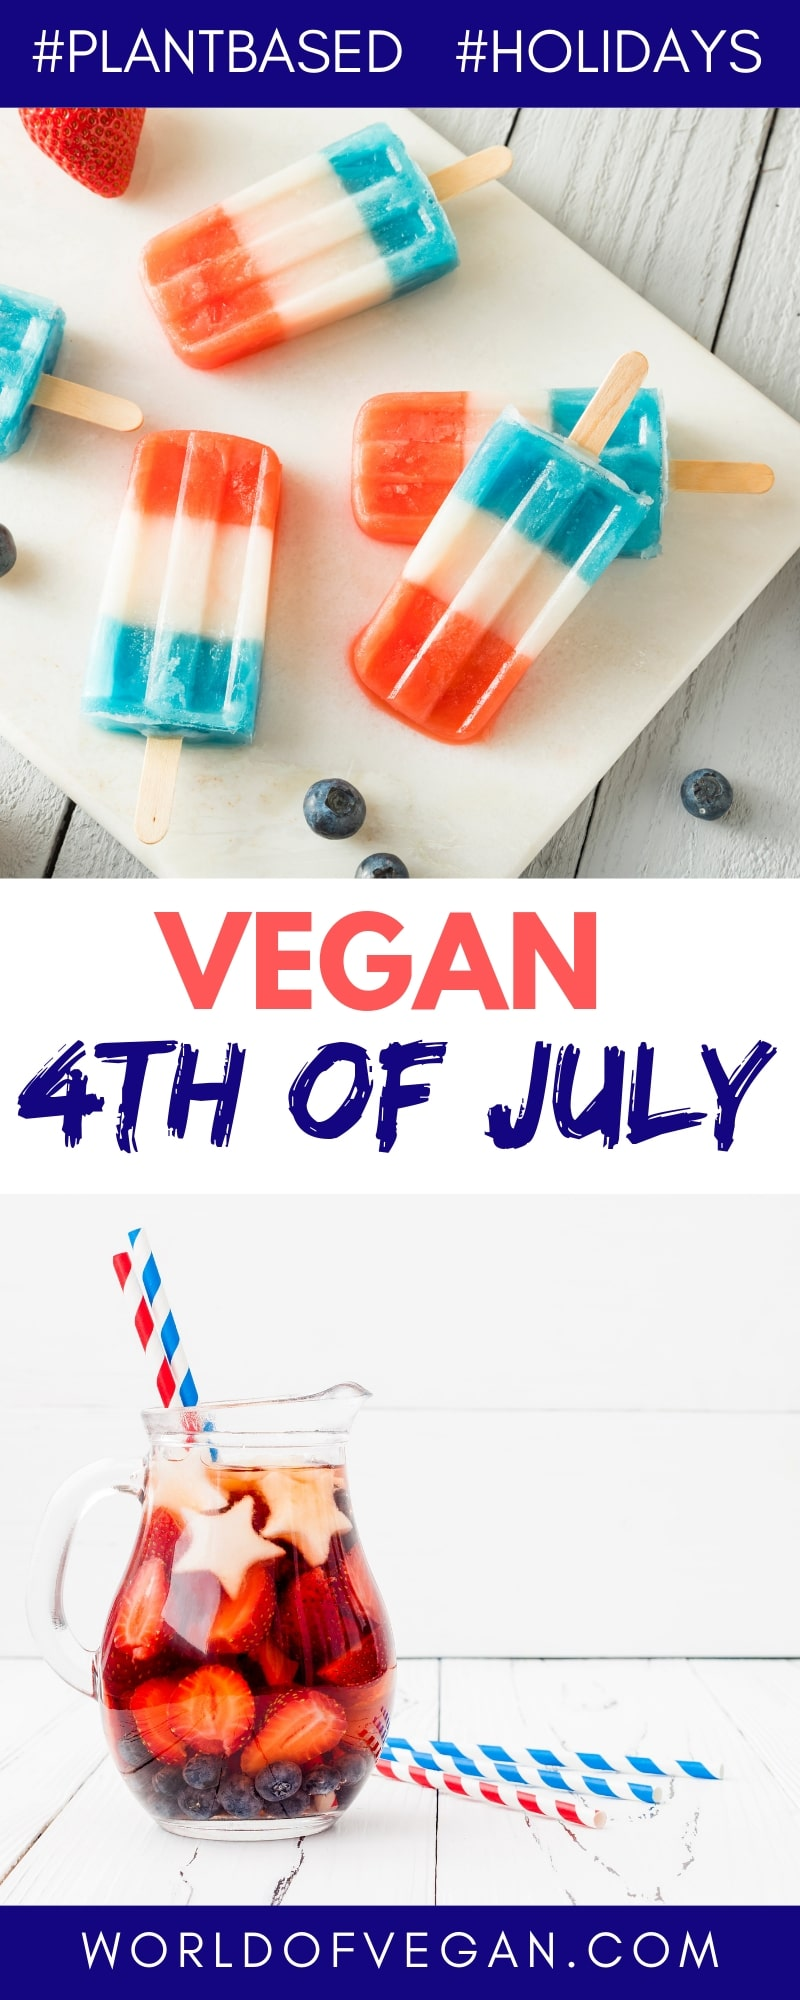 Festive 4th of July Vegan Foods | World of Vegan | #4thofjuly #vegan #party #food #holidays #summer #worldofvegan